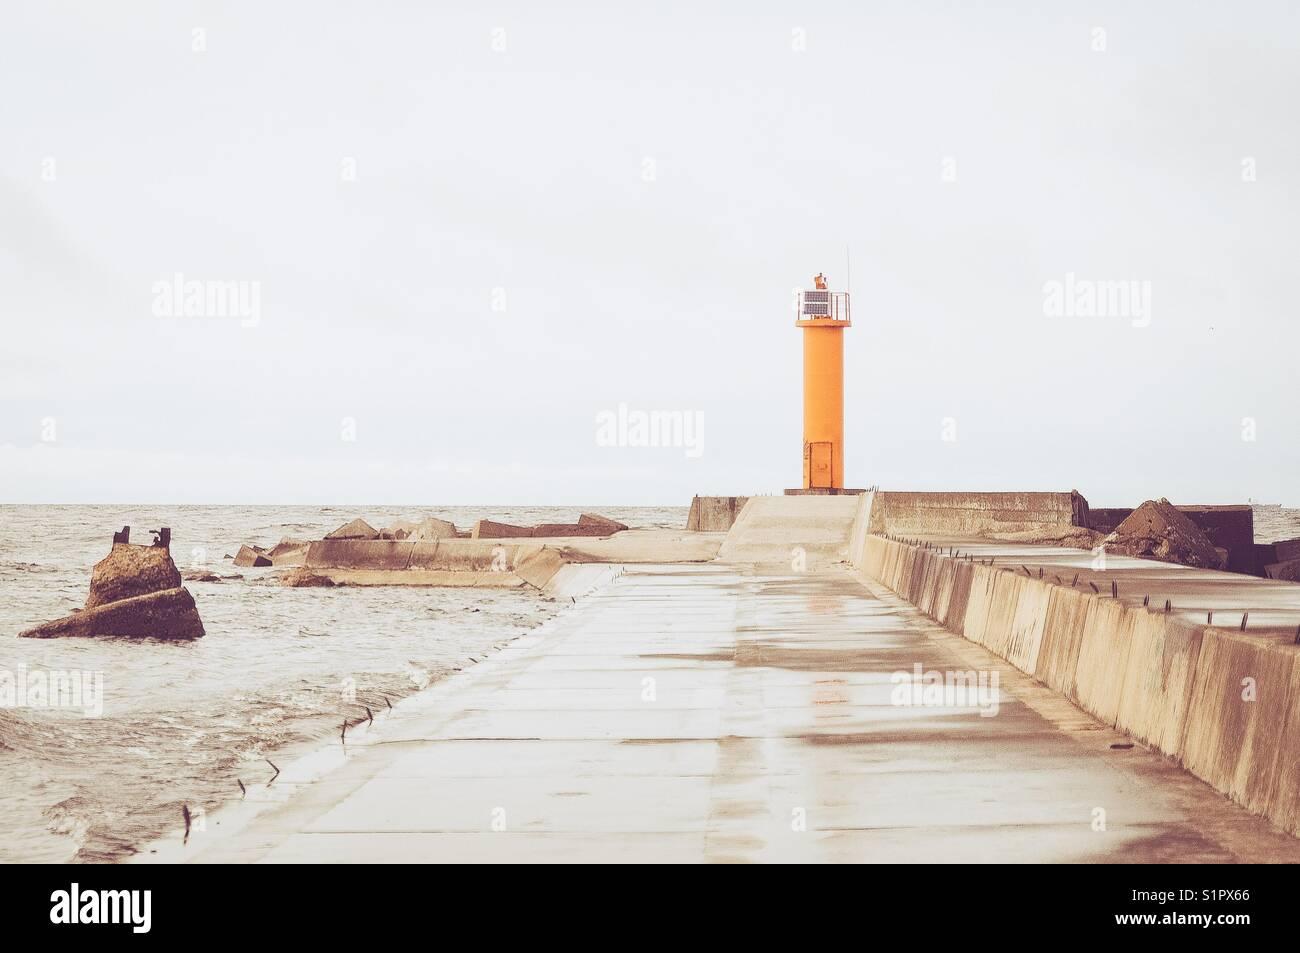 Ein Leuchtturm der Ostsee Mole. Stockbild